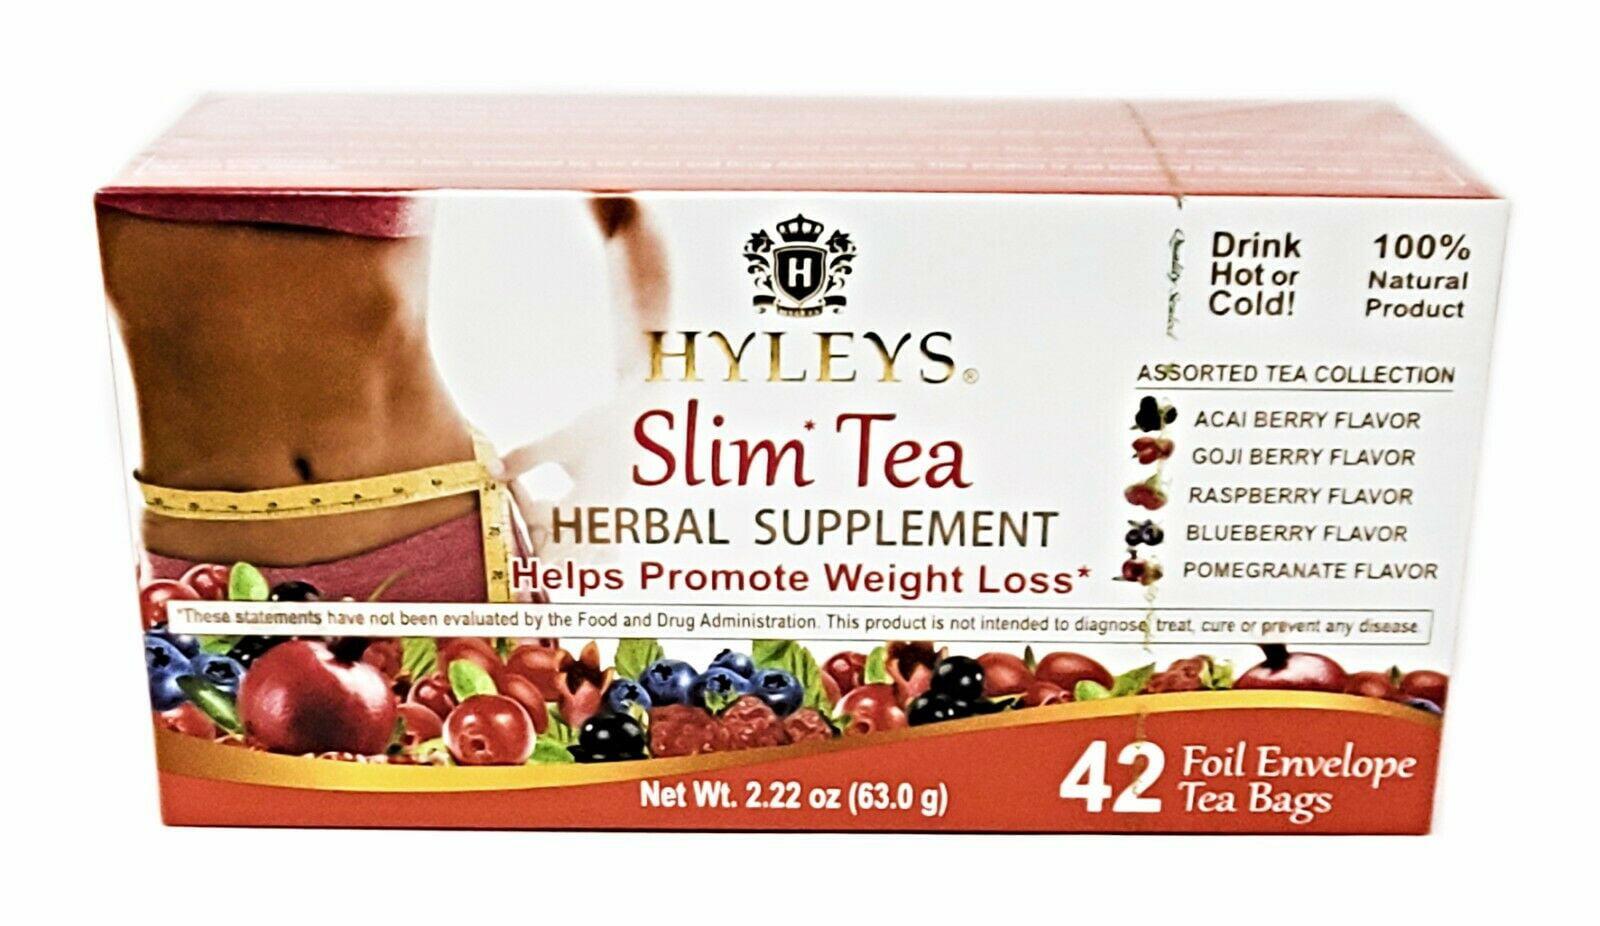 Hyleys Slim Tea Assorted Tea Collection 42 Tea Bags Weight Loss